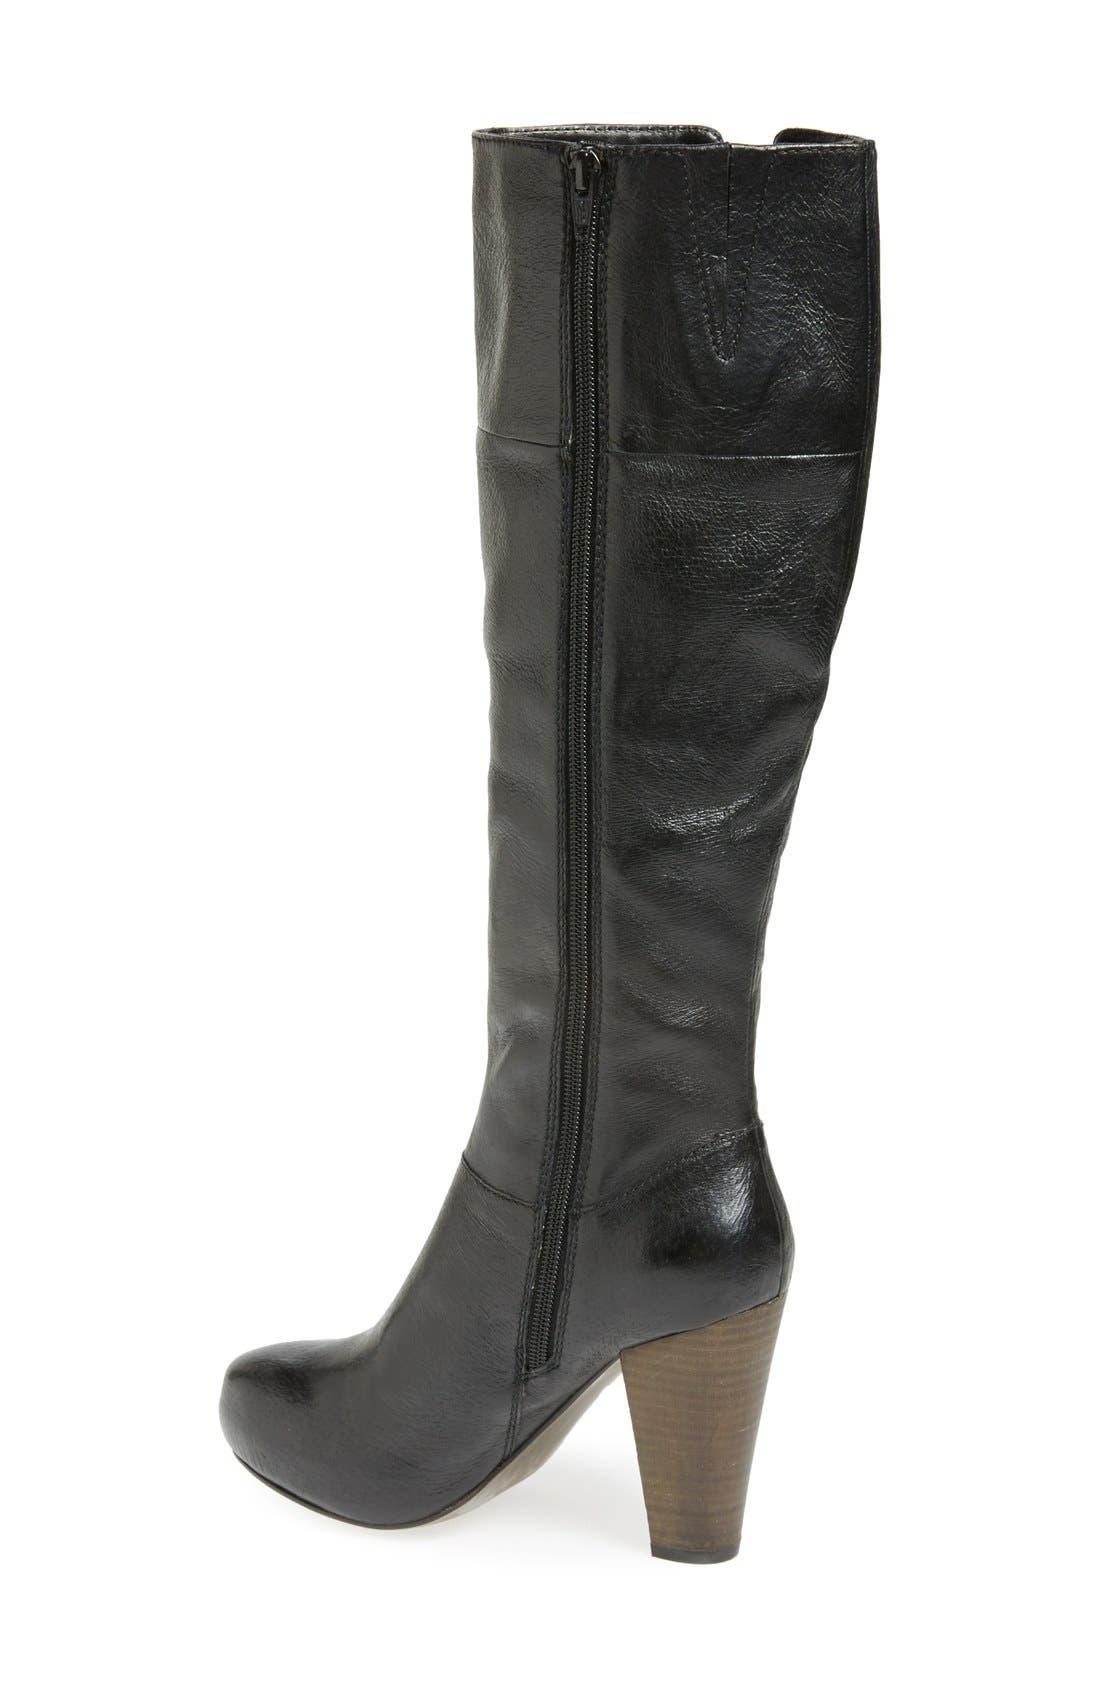 Alternate Image 2  - Steve Madden 'Rikki' Tall Riding Boot (Women)